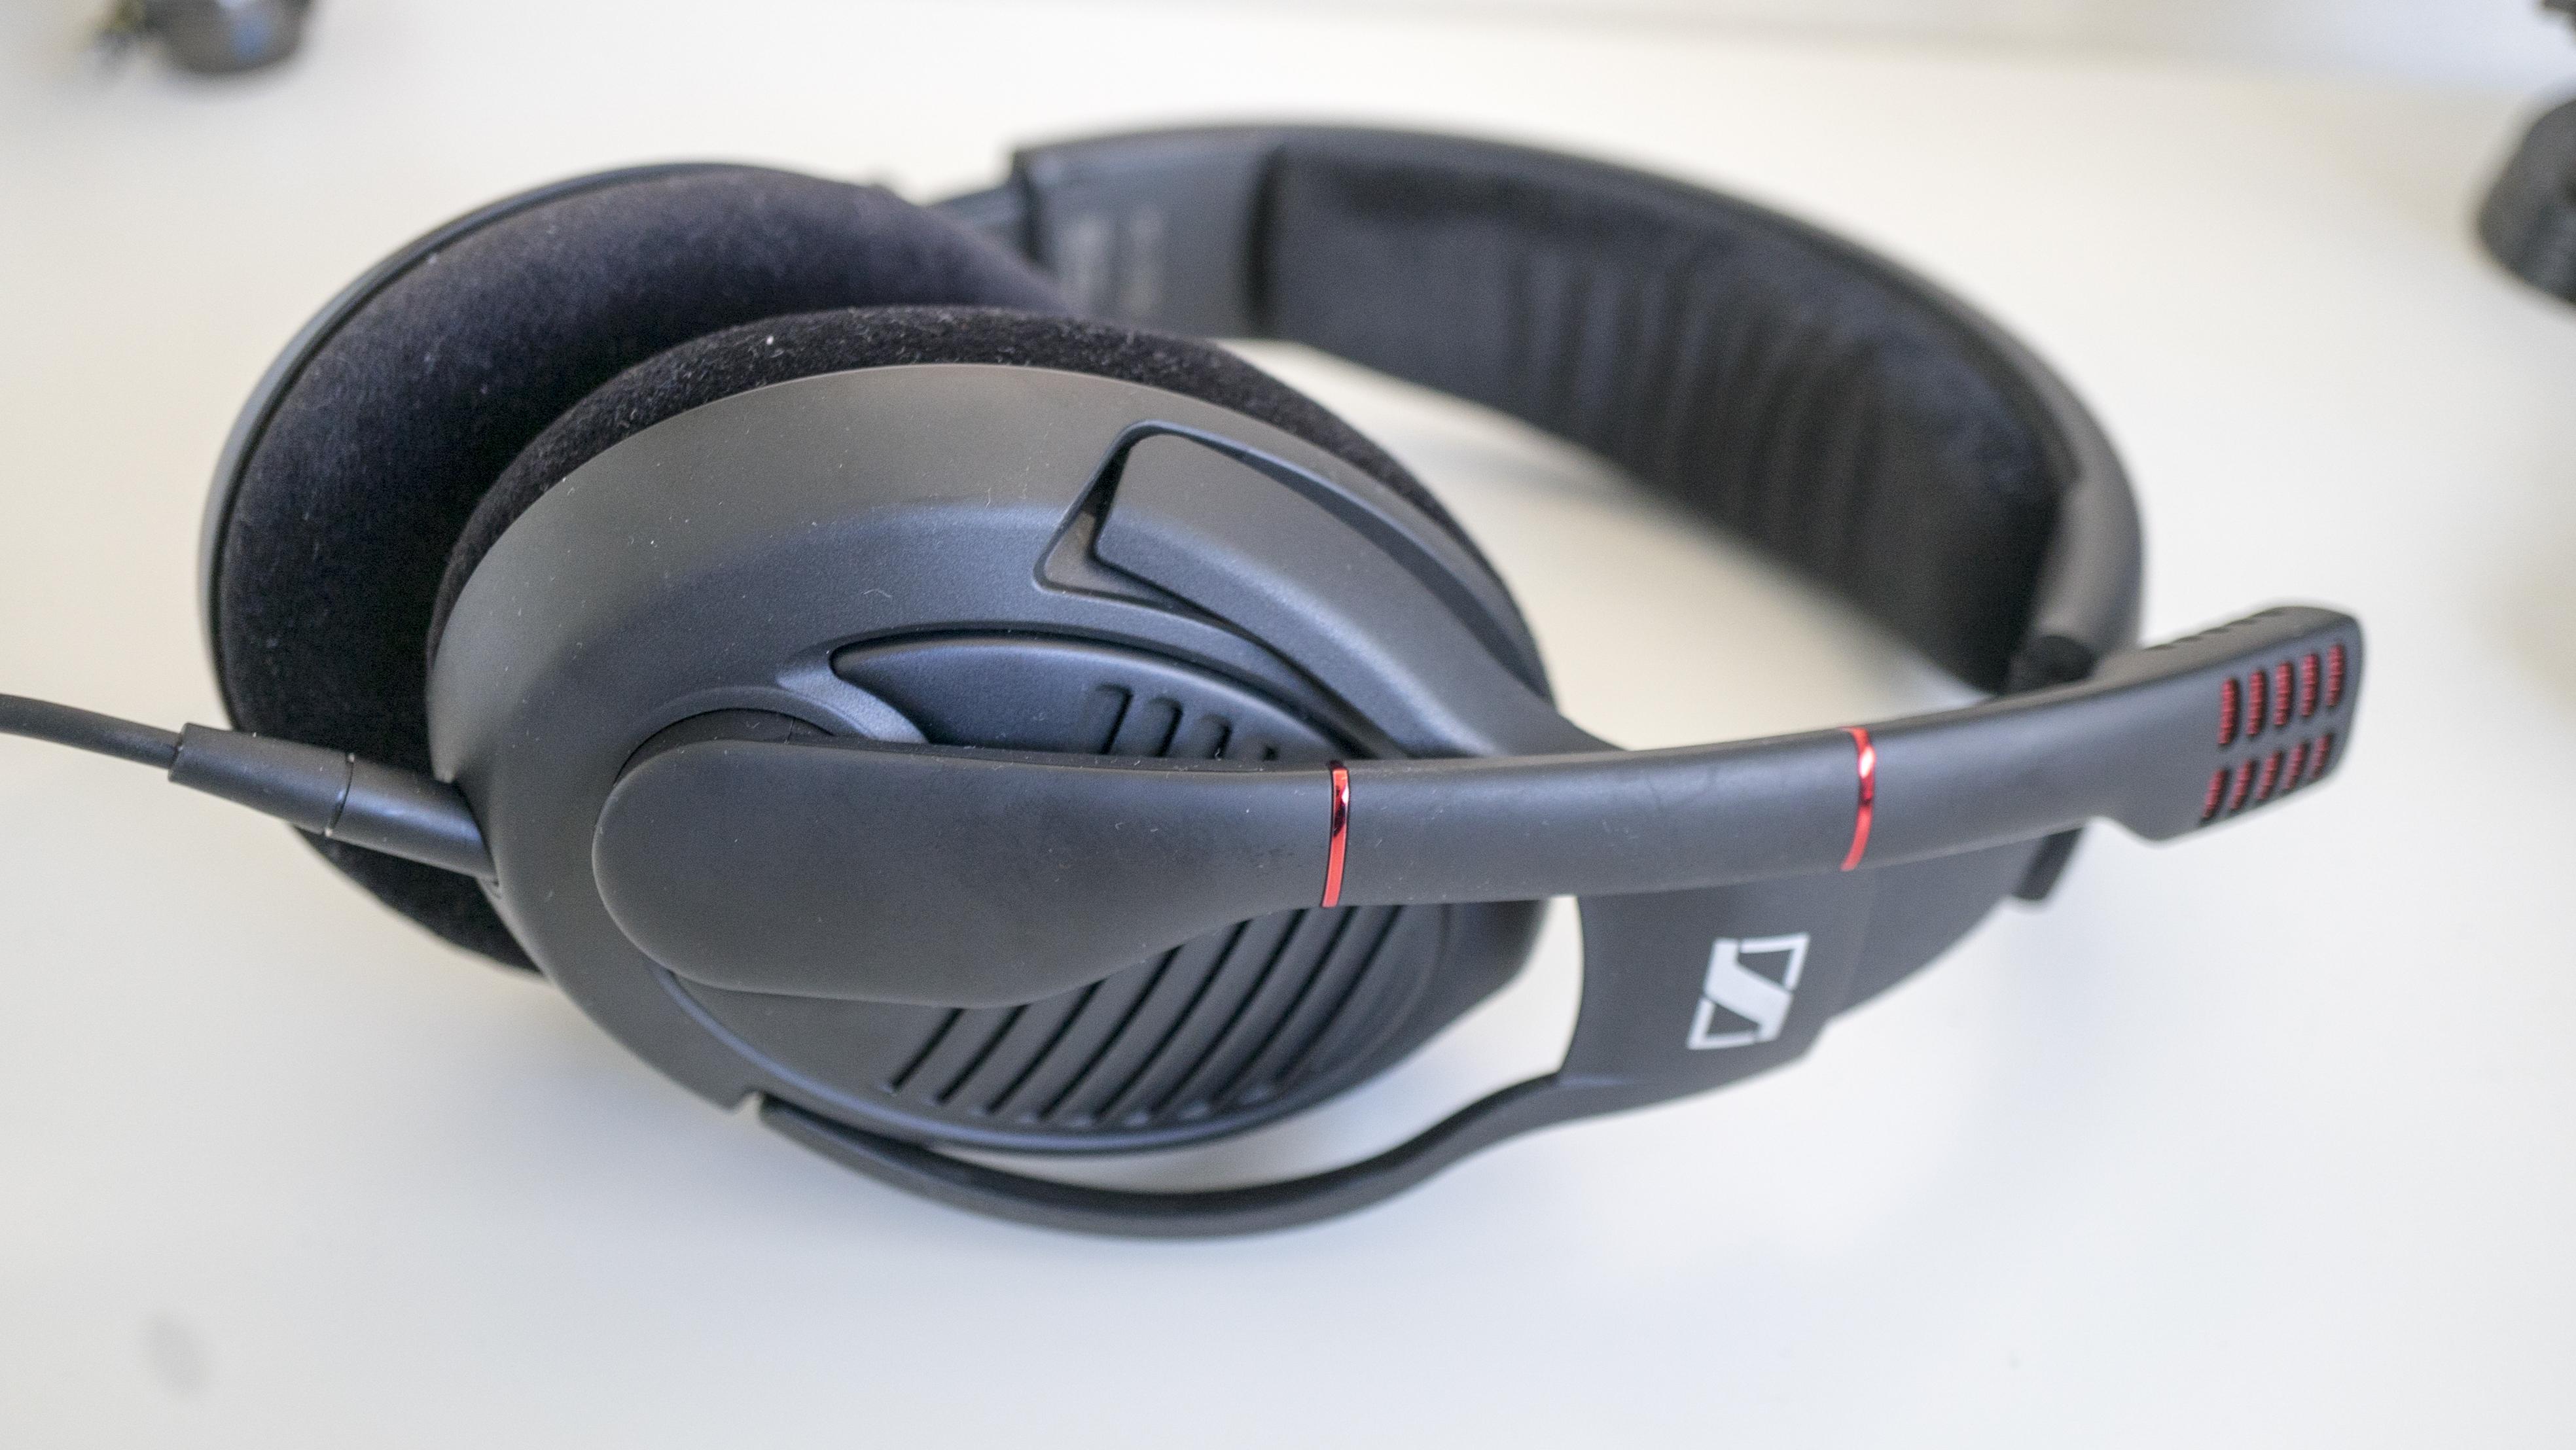 sennheiser pc 373d gaming headset review. Black Bedroom Furniture Sets. Home Design Ideas